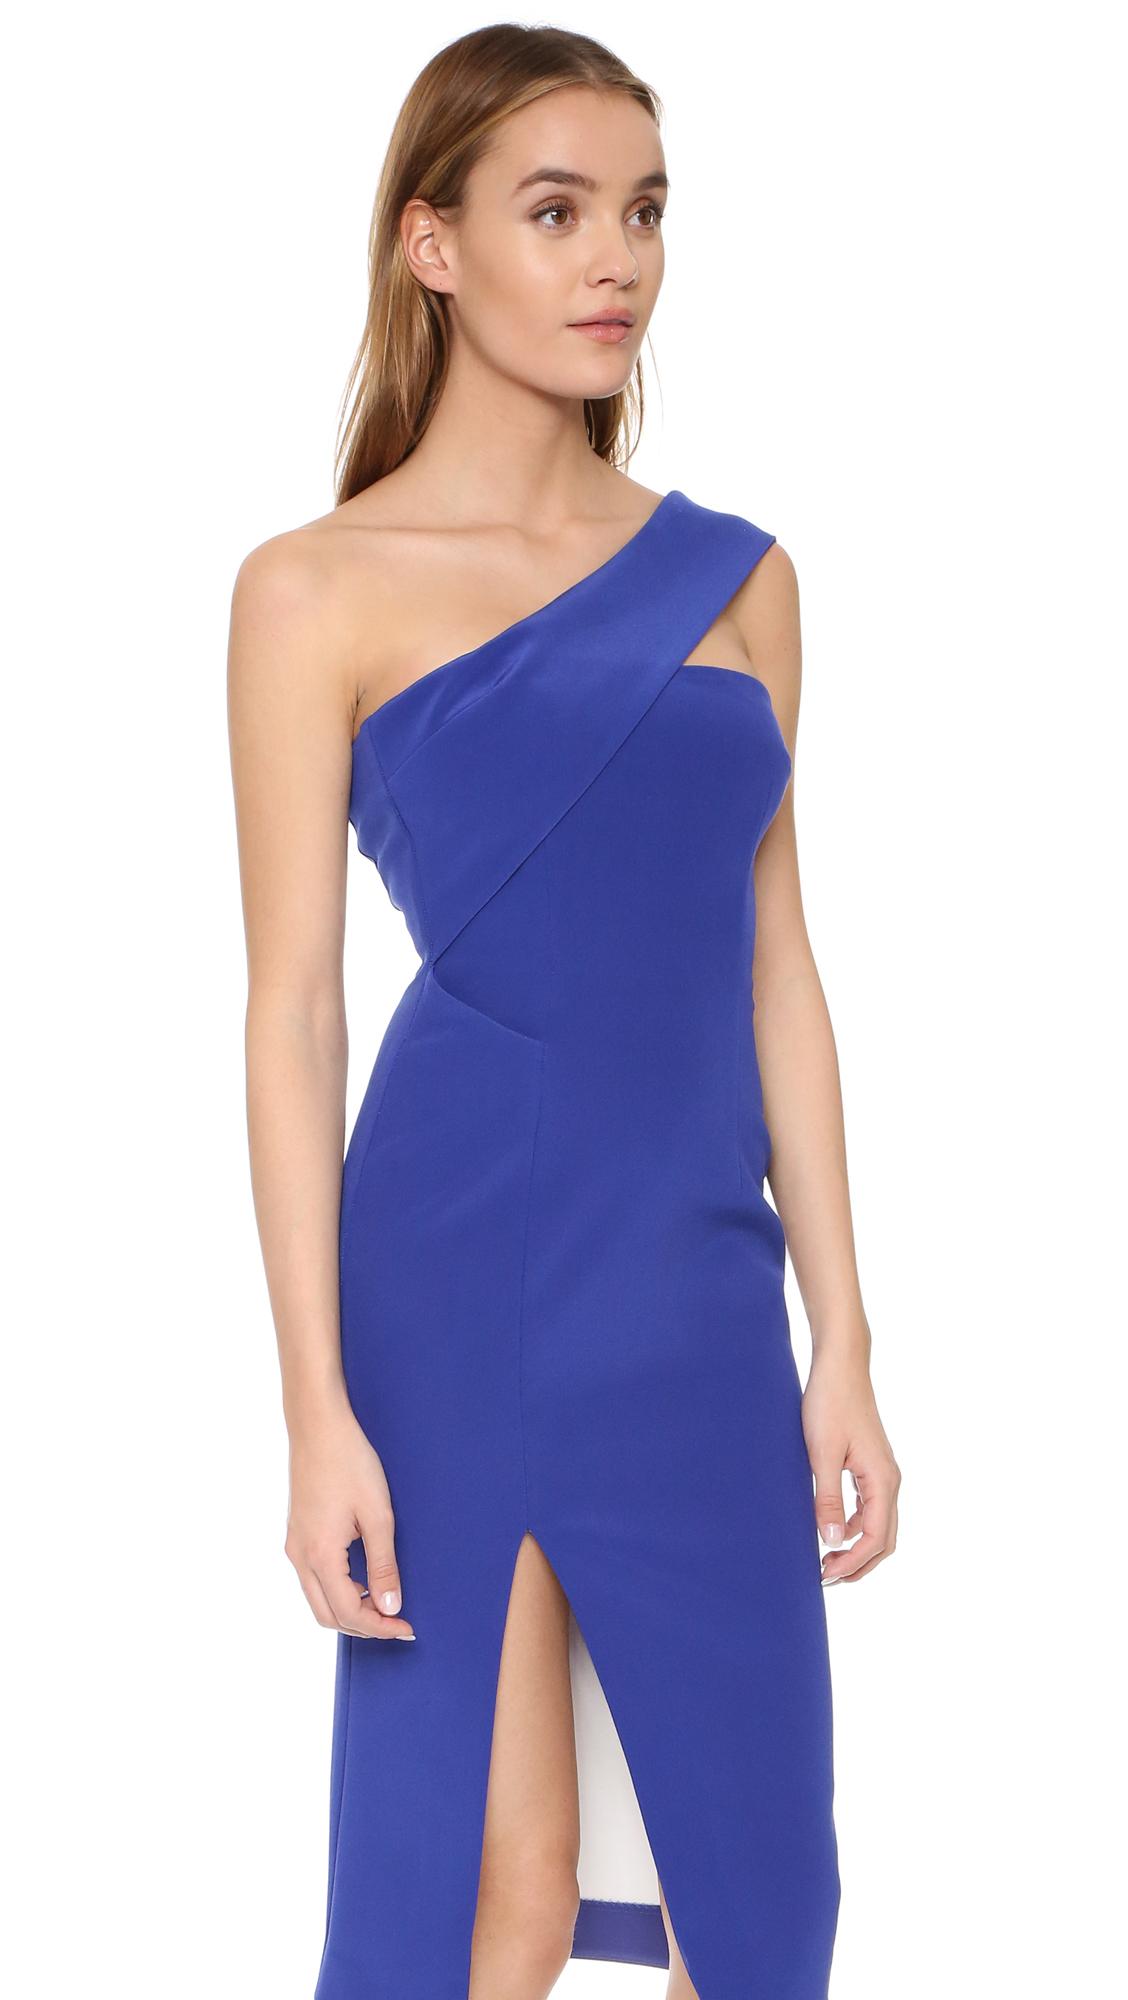 Nicholas Tech Bonded One Shoulder Dress in Blue | Lyst